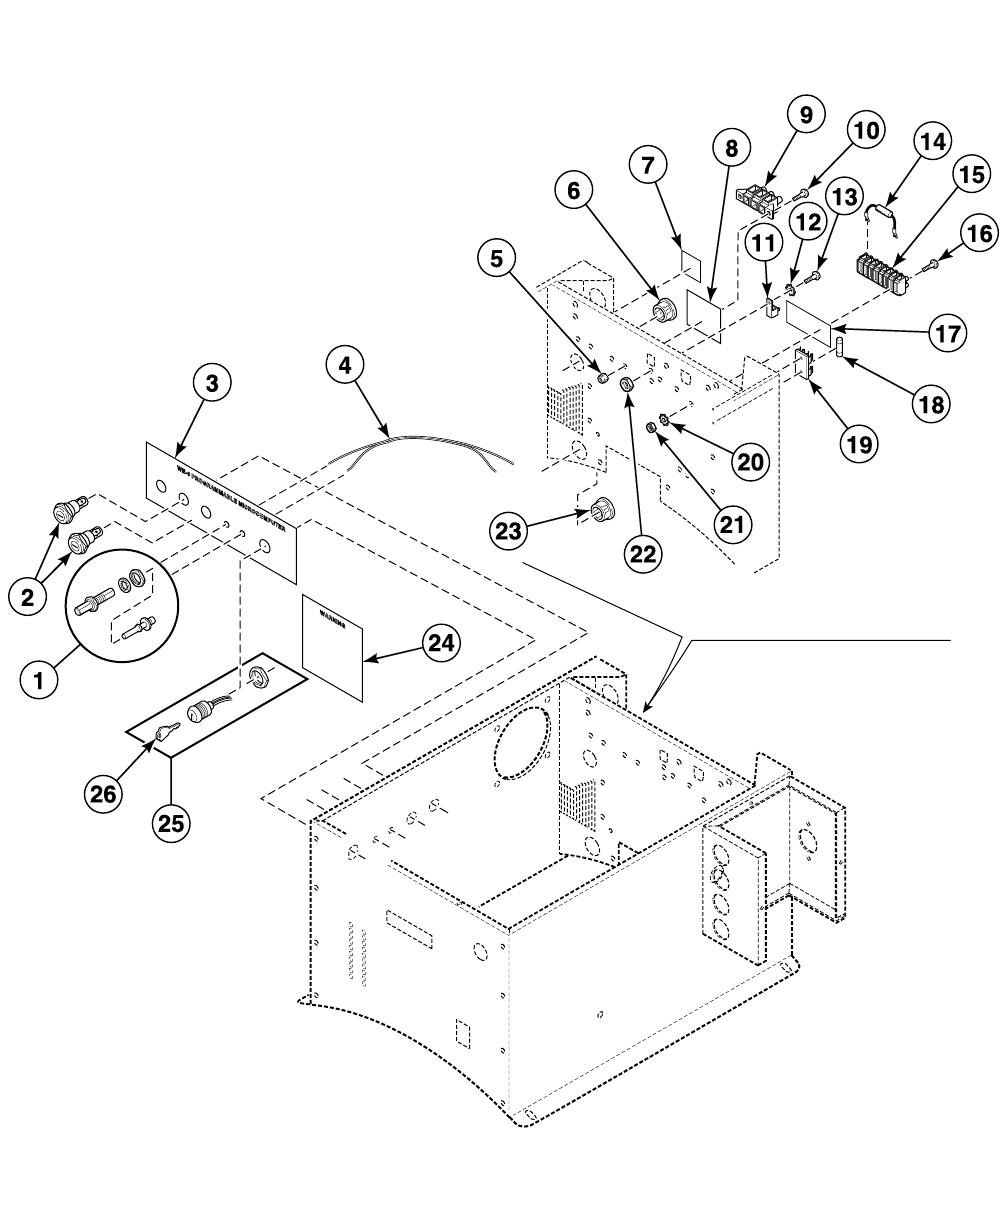 Washer Extractor Parts Manual Uw125av F232184 F430 Can Bus Diagram 14